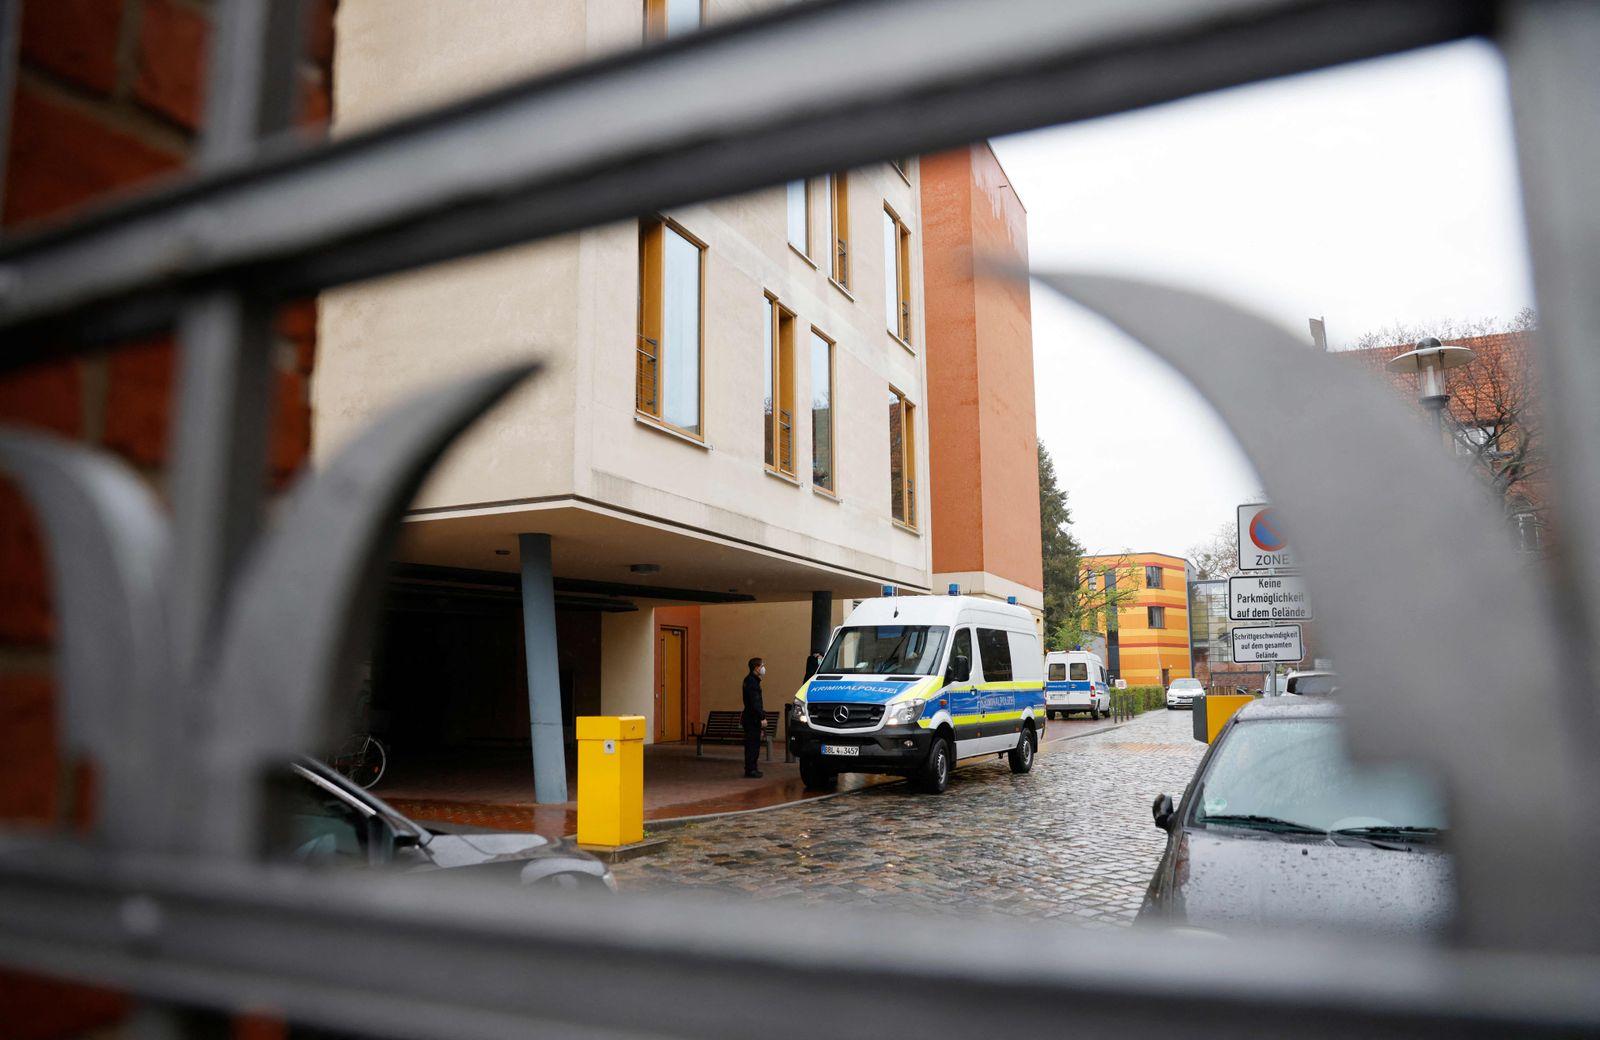 GERMANY-CRIME-HOSPITAL-DISABLED-POLICE